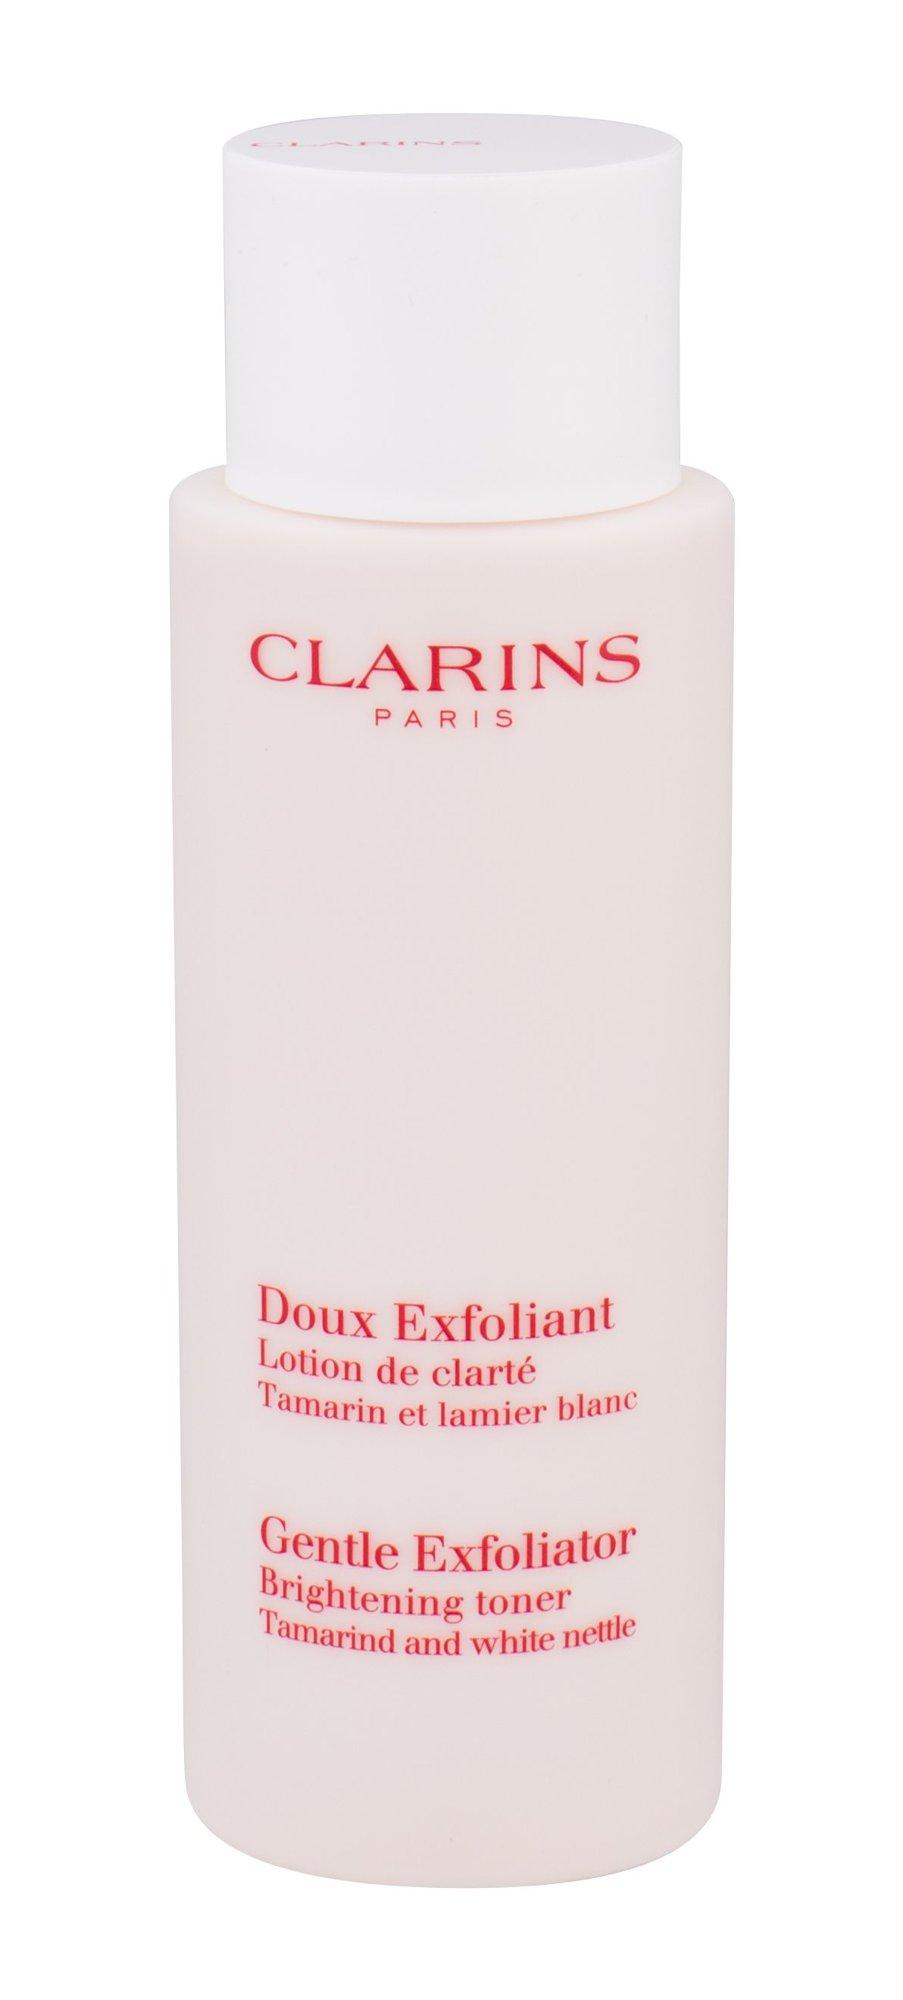 Clarins Gentle Exfoliator Cosmetic 125ml